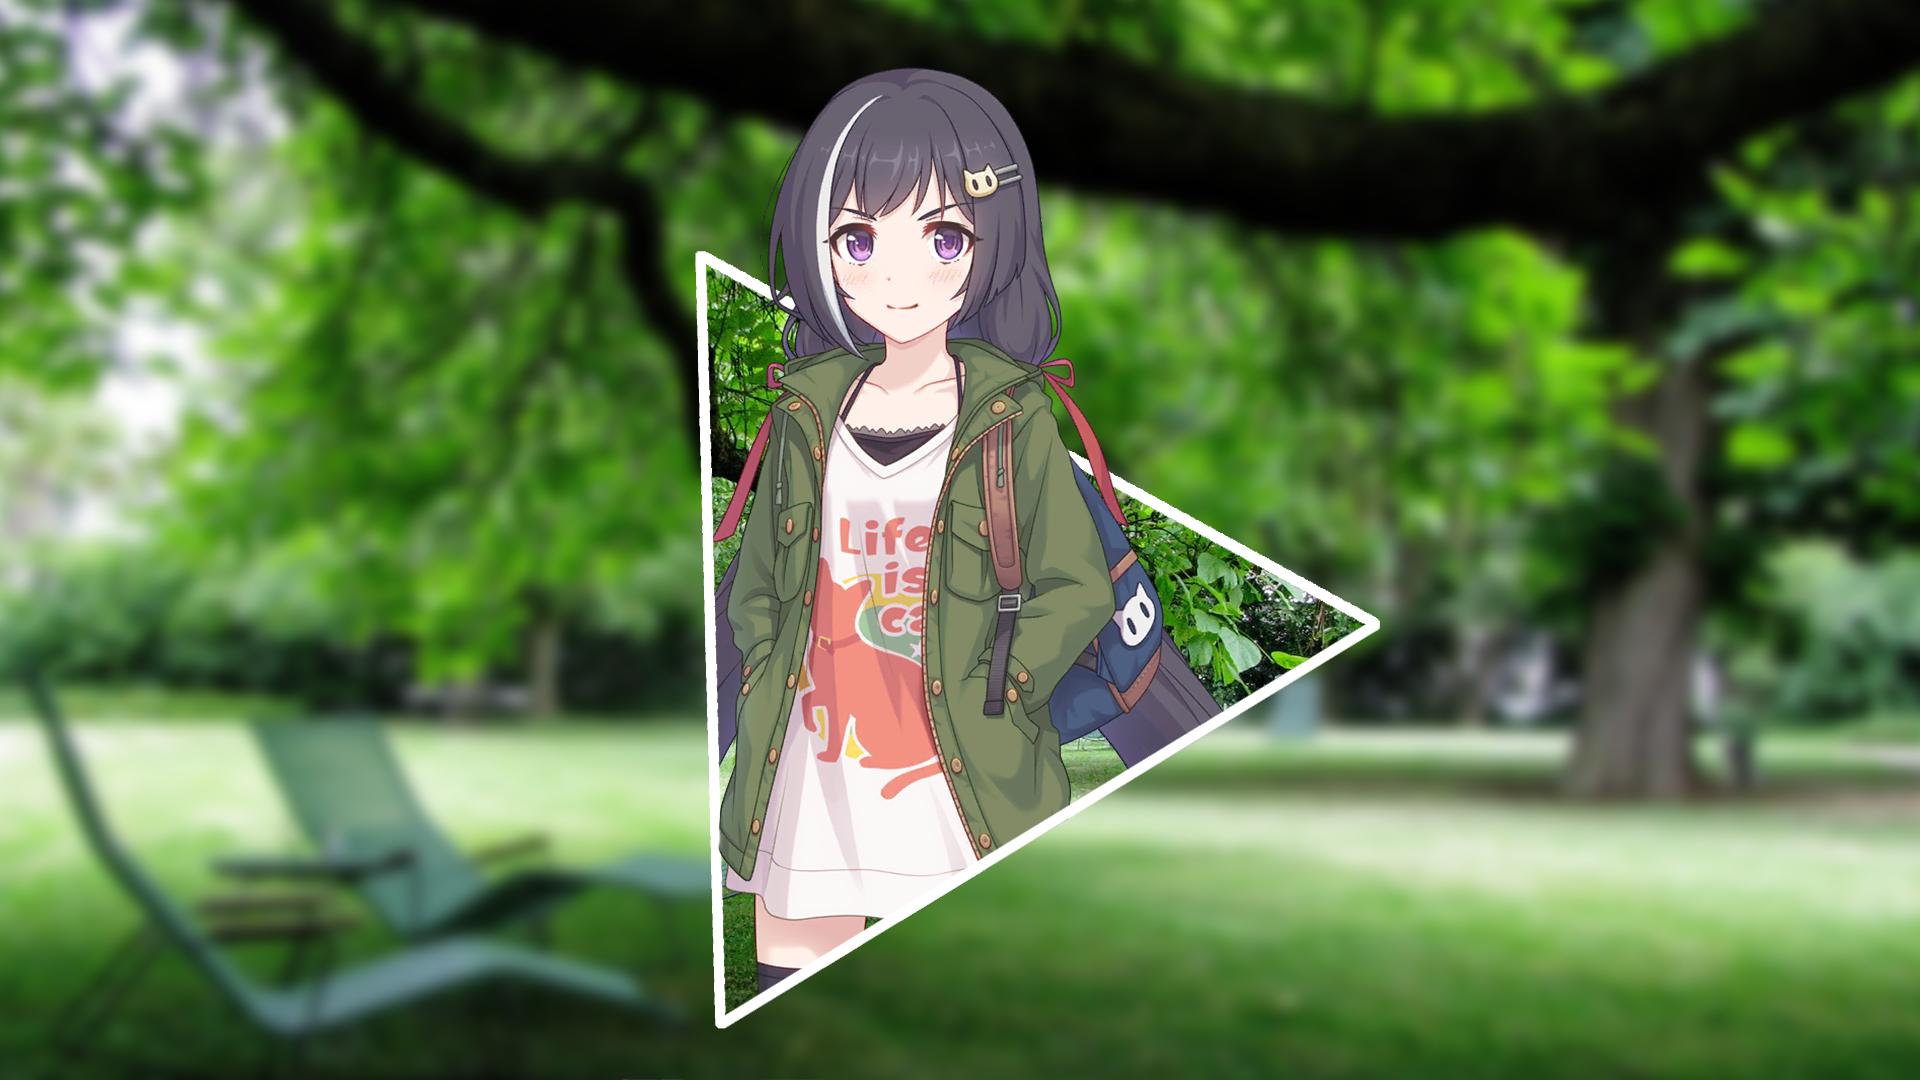 Anime Girls Kyaru Princess Connect Princess Connect Re Dive Anime Nature Blurred Purple Eyes Triangl 1920x1080